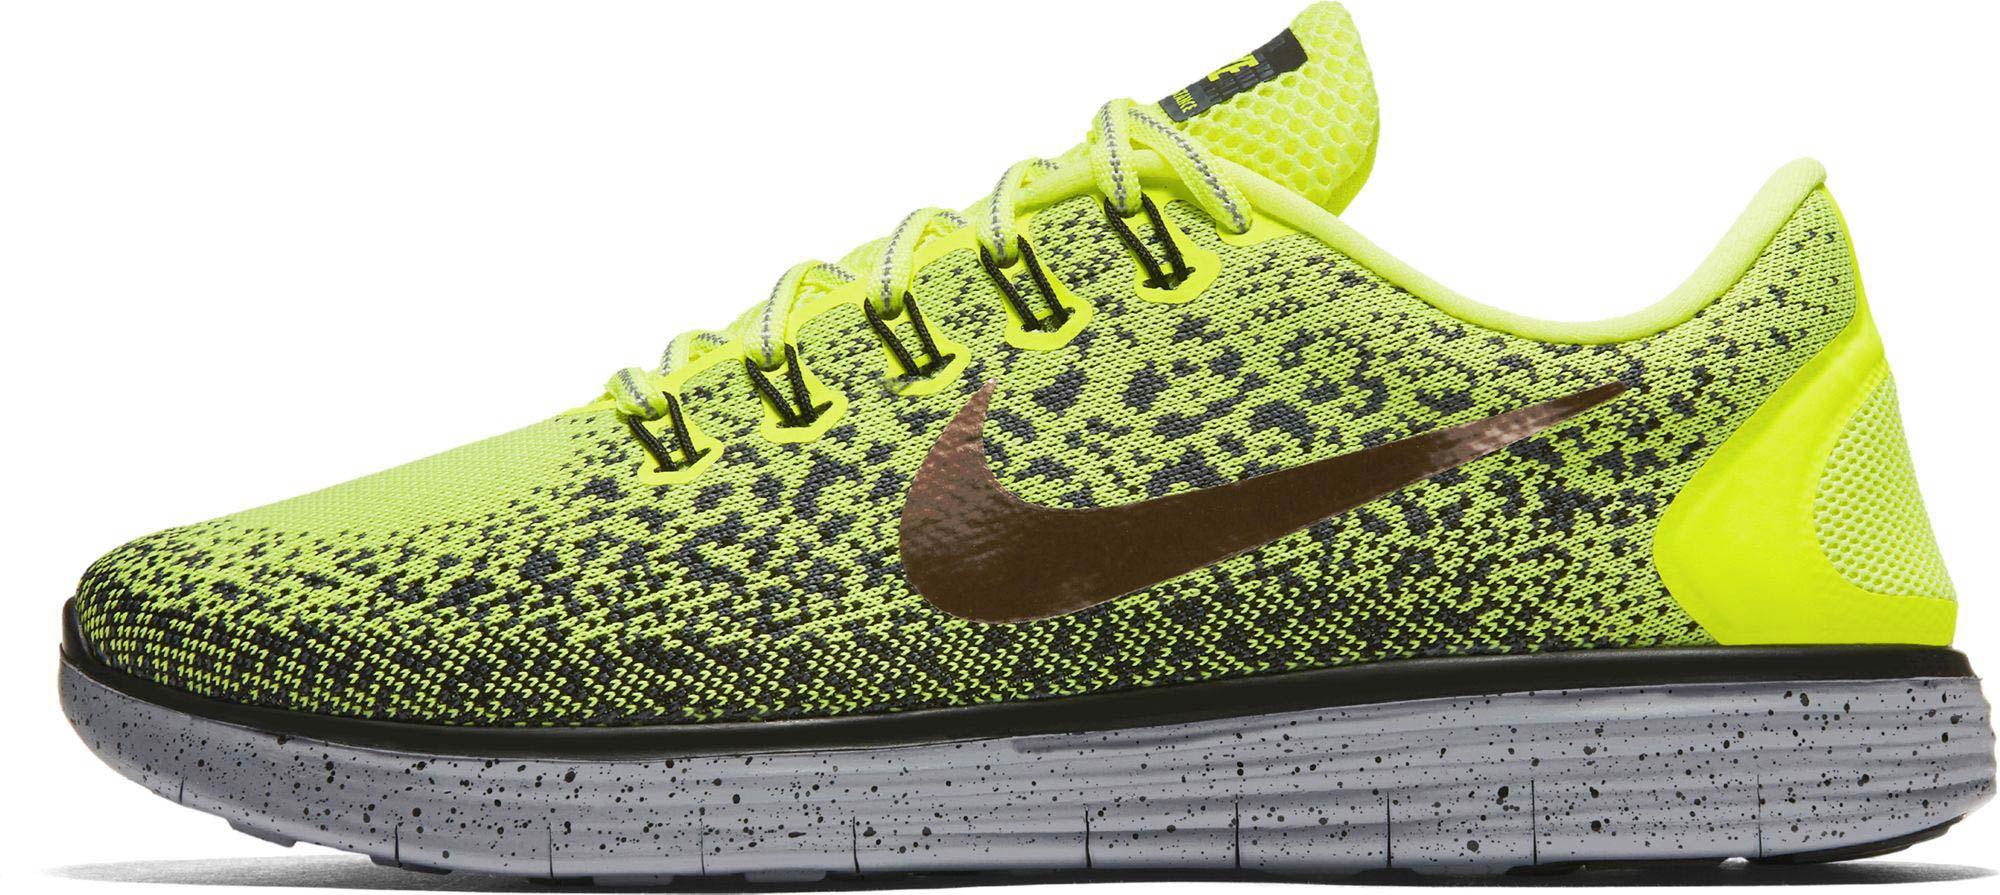 brand new cb7c9 38cc6 Nike FREE RN DISTANCE SHIELD